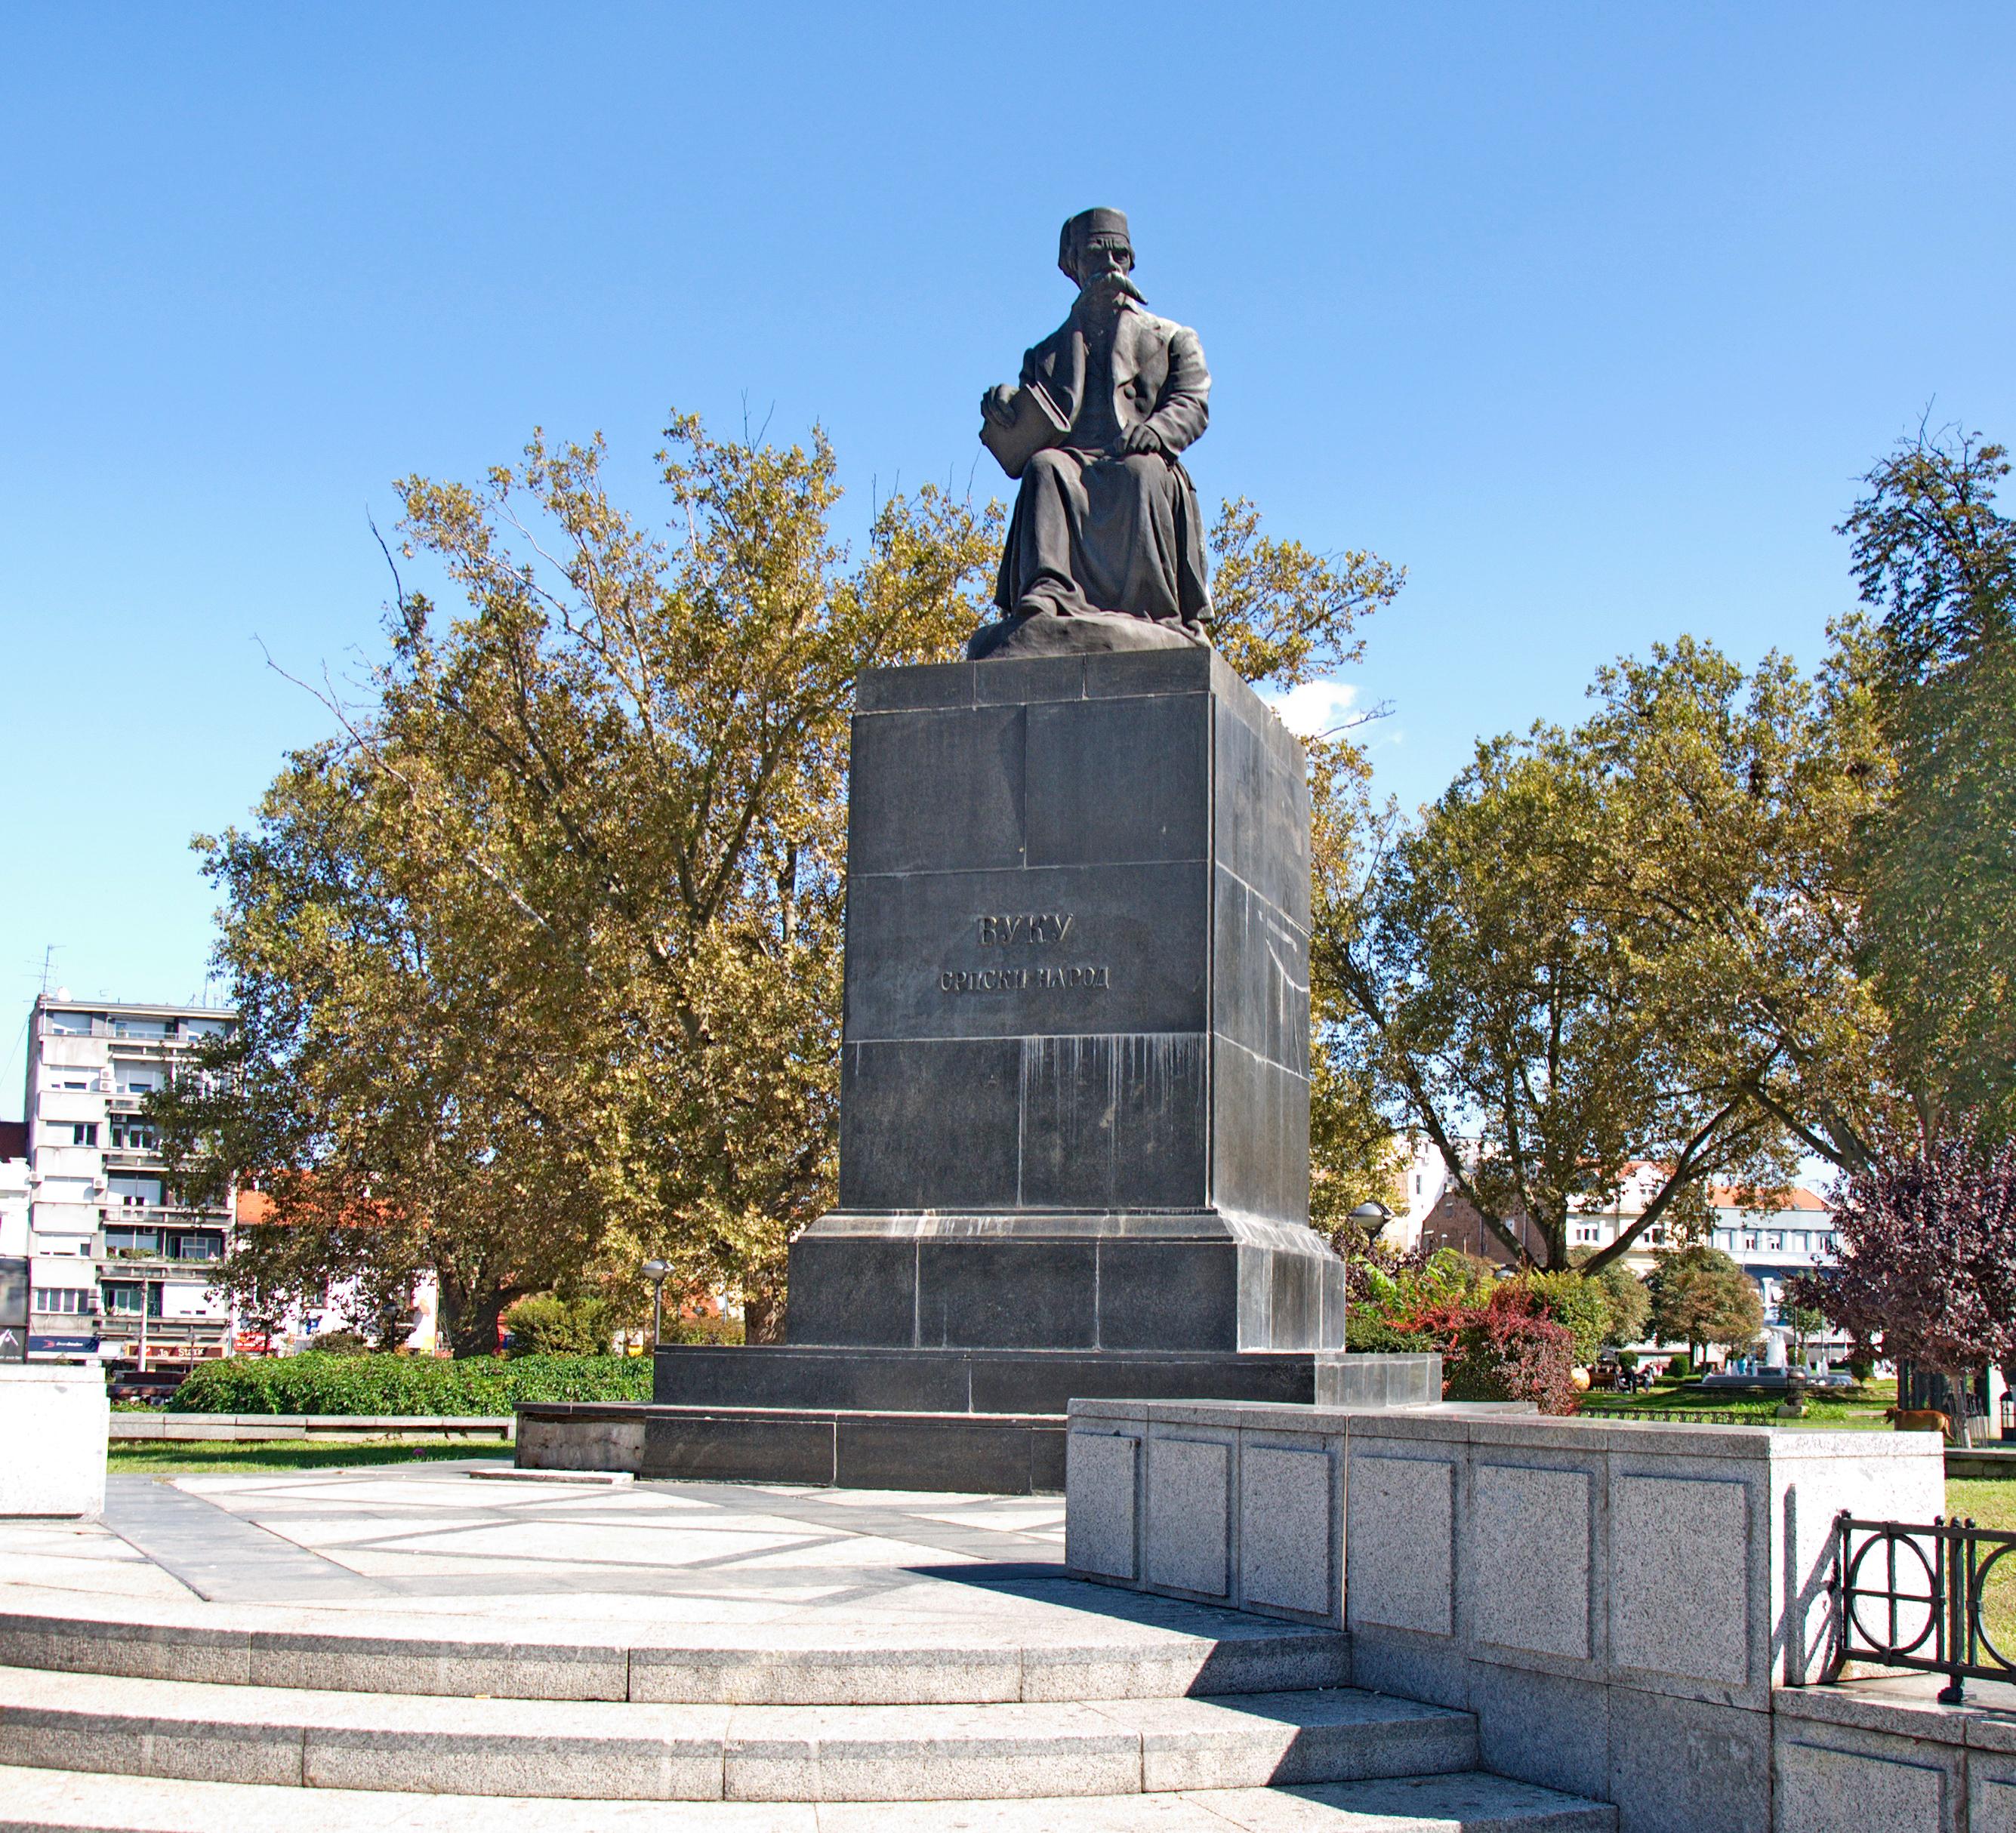 File Spomenik Vuku Karadzicu U Beogradu 07 Jpg Wikimedia Commons